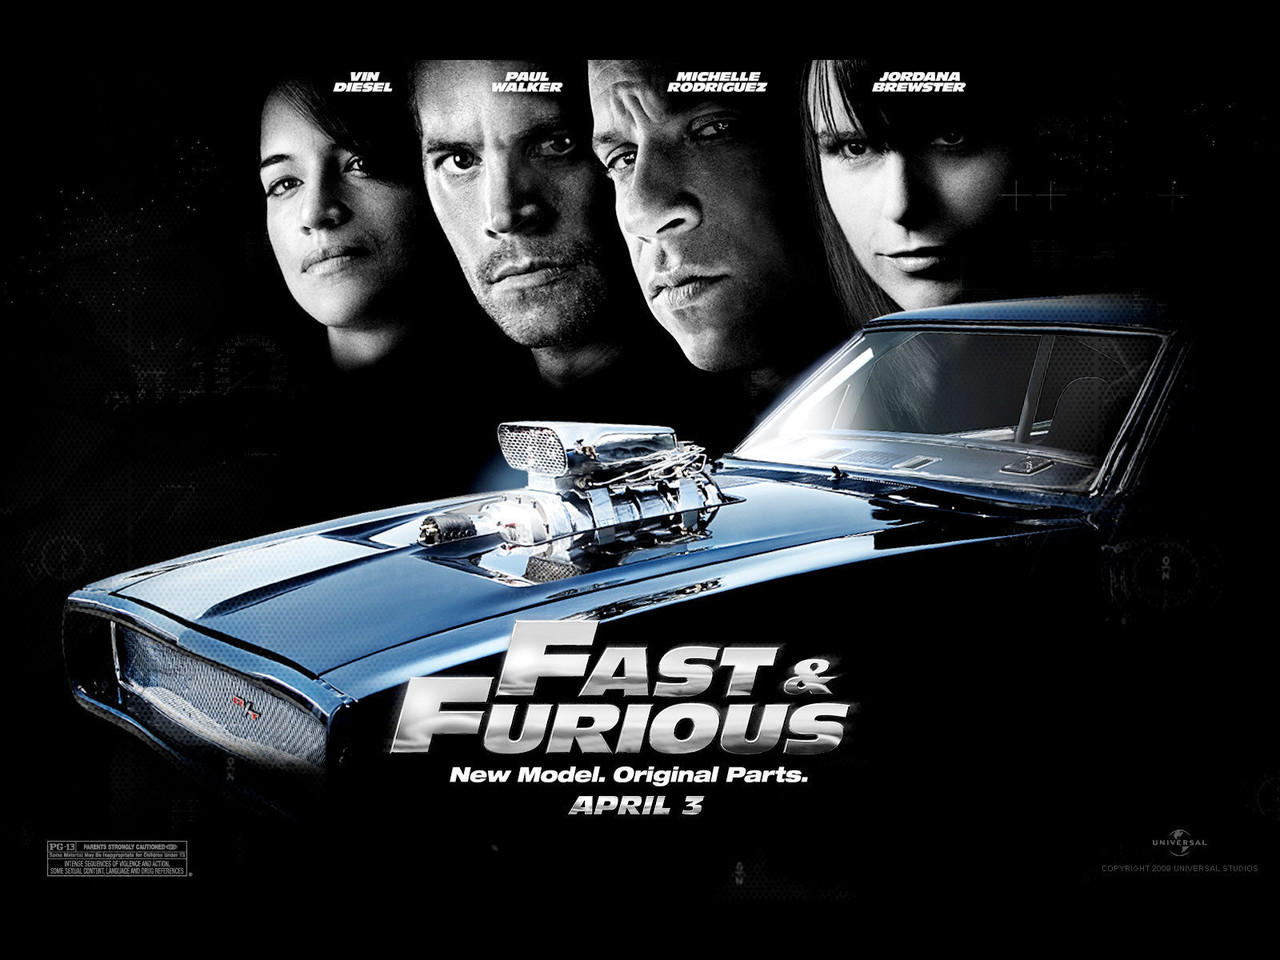 Bagaimana Kelanjutan Film Fast Furious Tanpa Siganteng Paul walker [Meninggal]